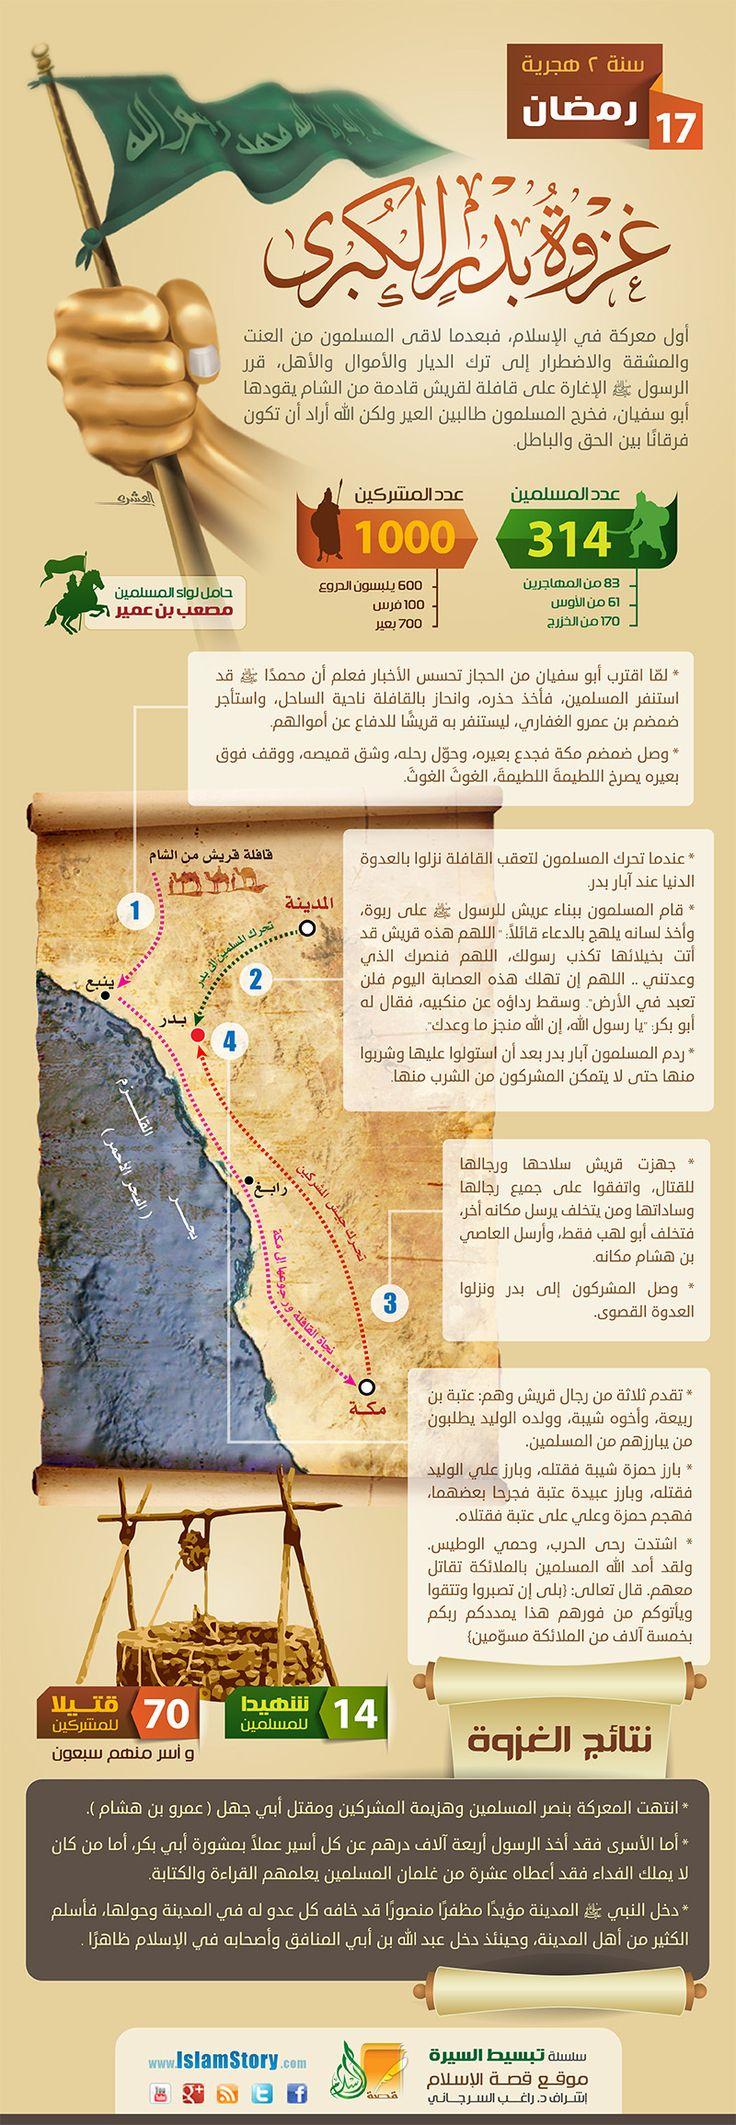 DesertRose ...إنفو جرافيك غزوة بدر موقع قصة الإسلام -